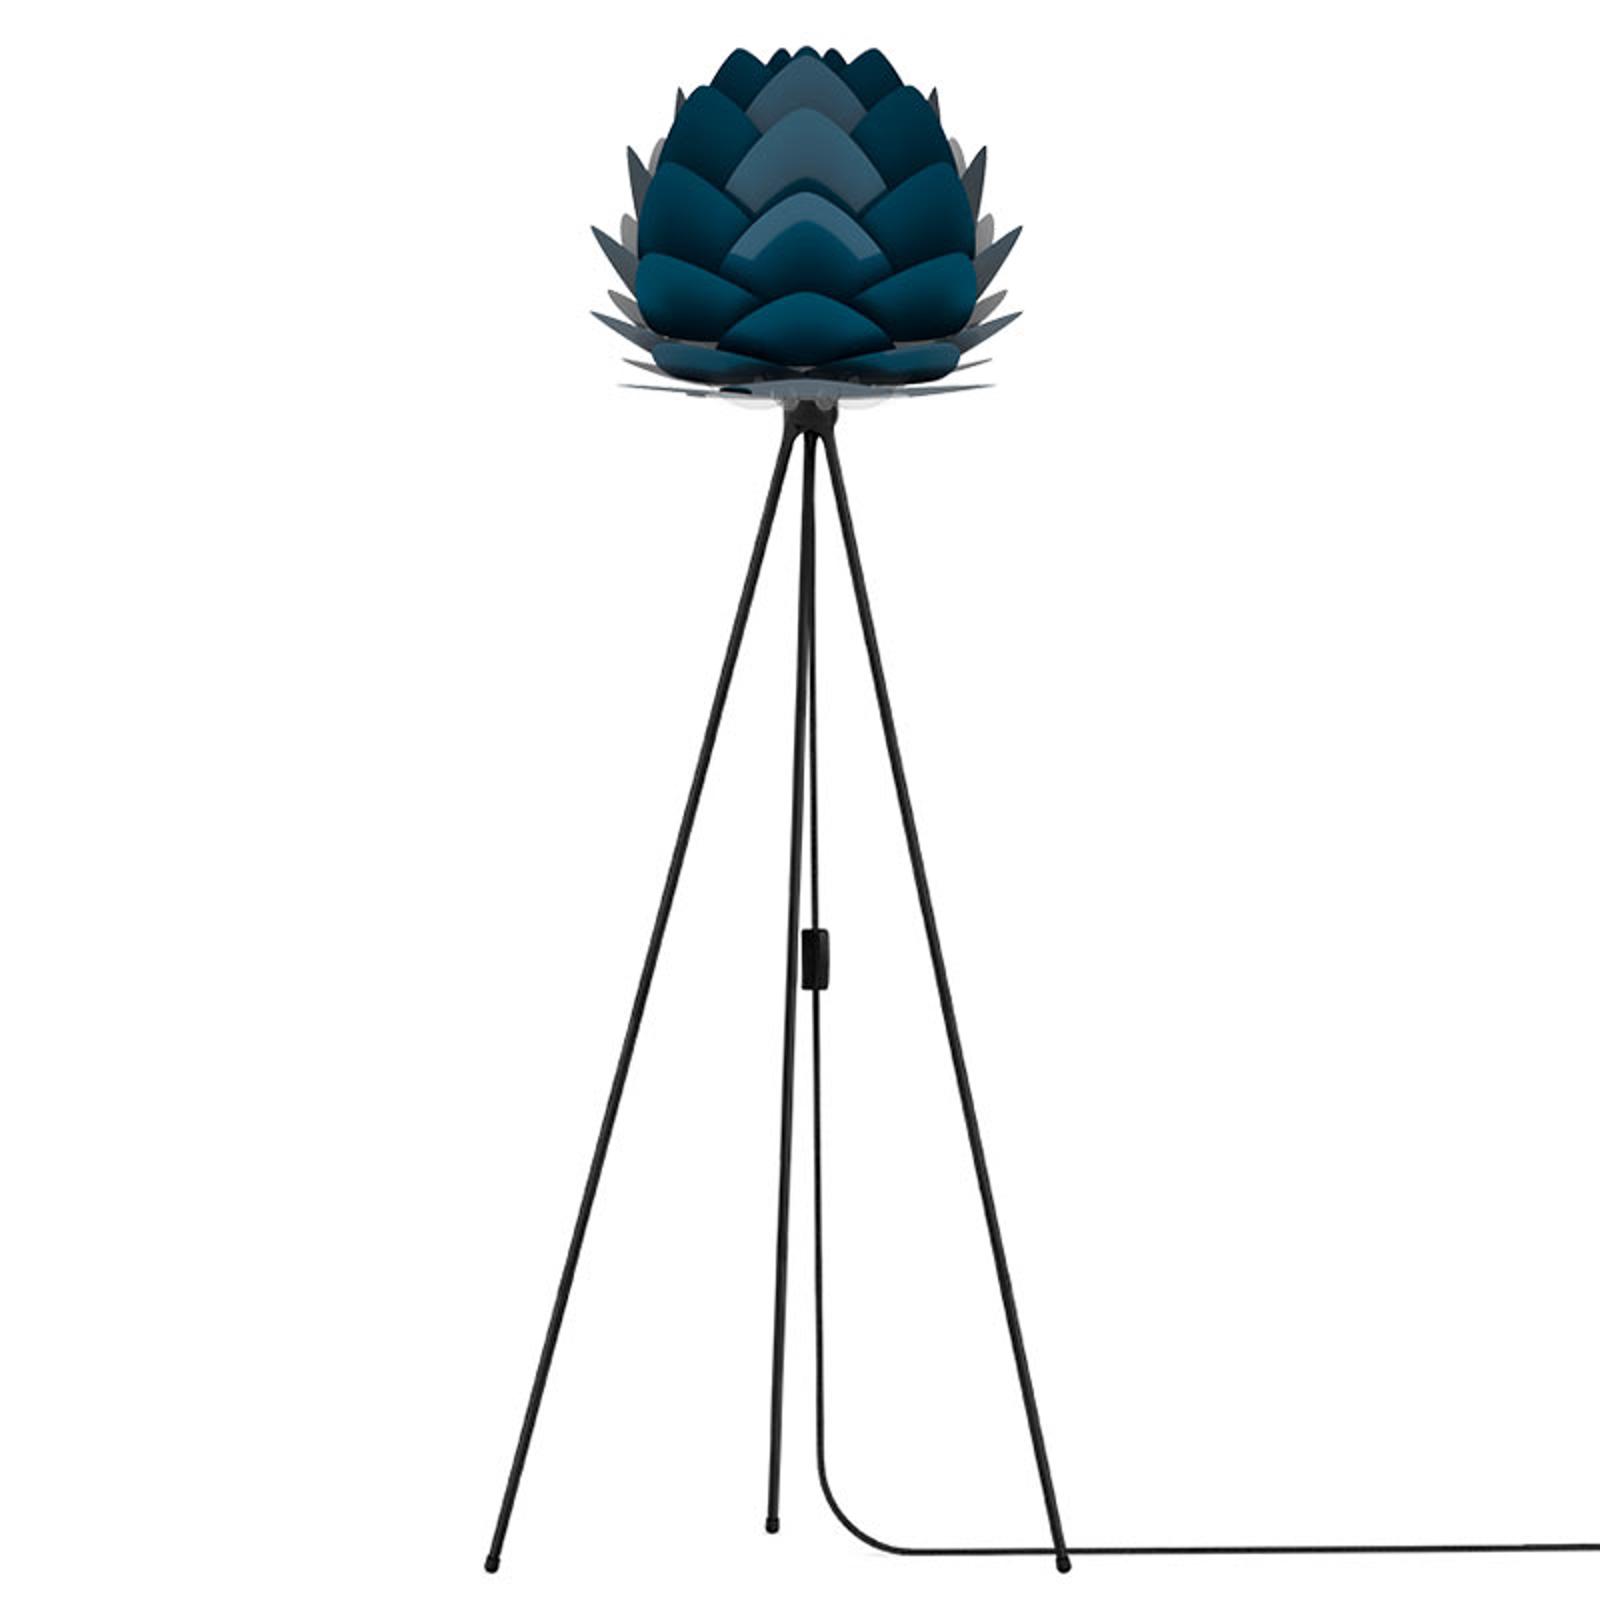 UMAGE Aluvia mini lampadaire noir/bleu